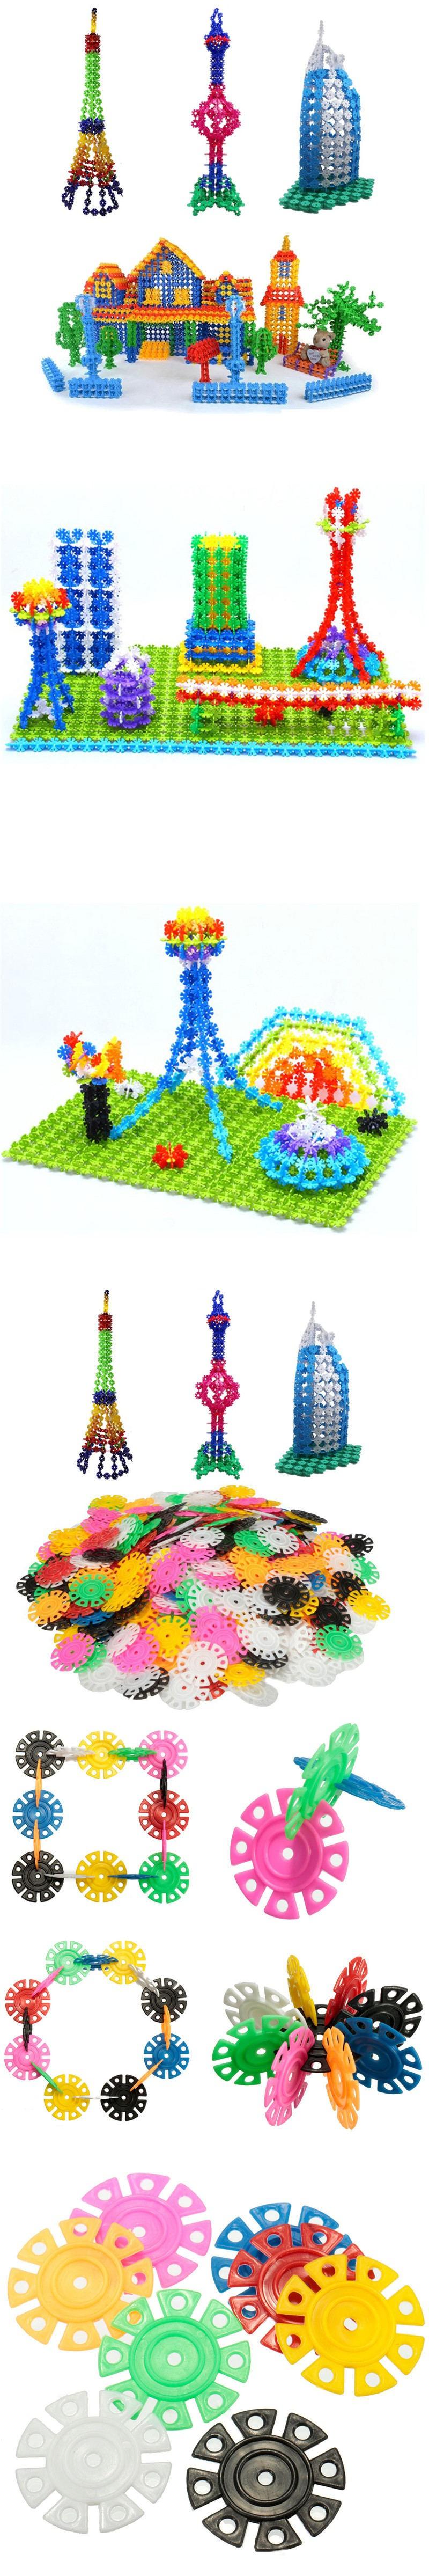 Brand New 400 pcs Multicolor Kids Snowflake Building Puzzle Blocks